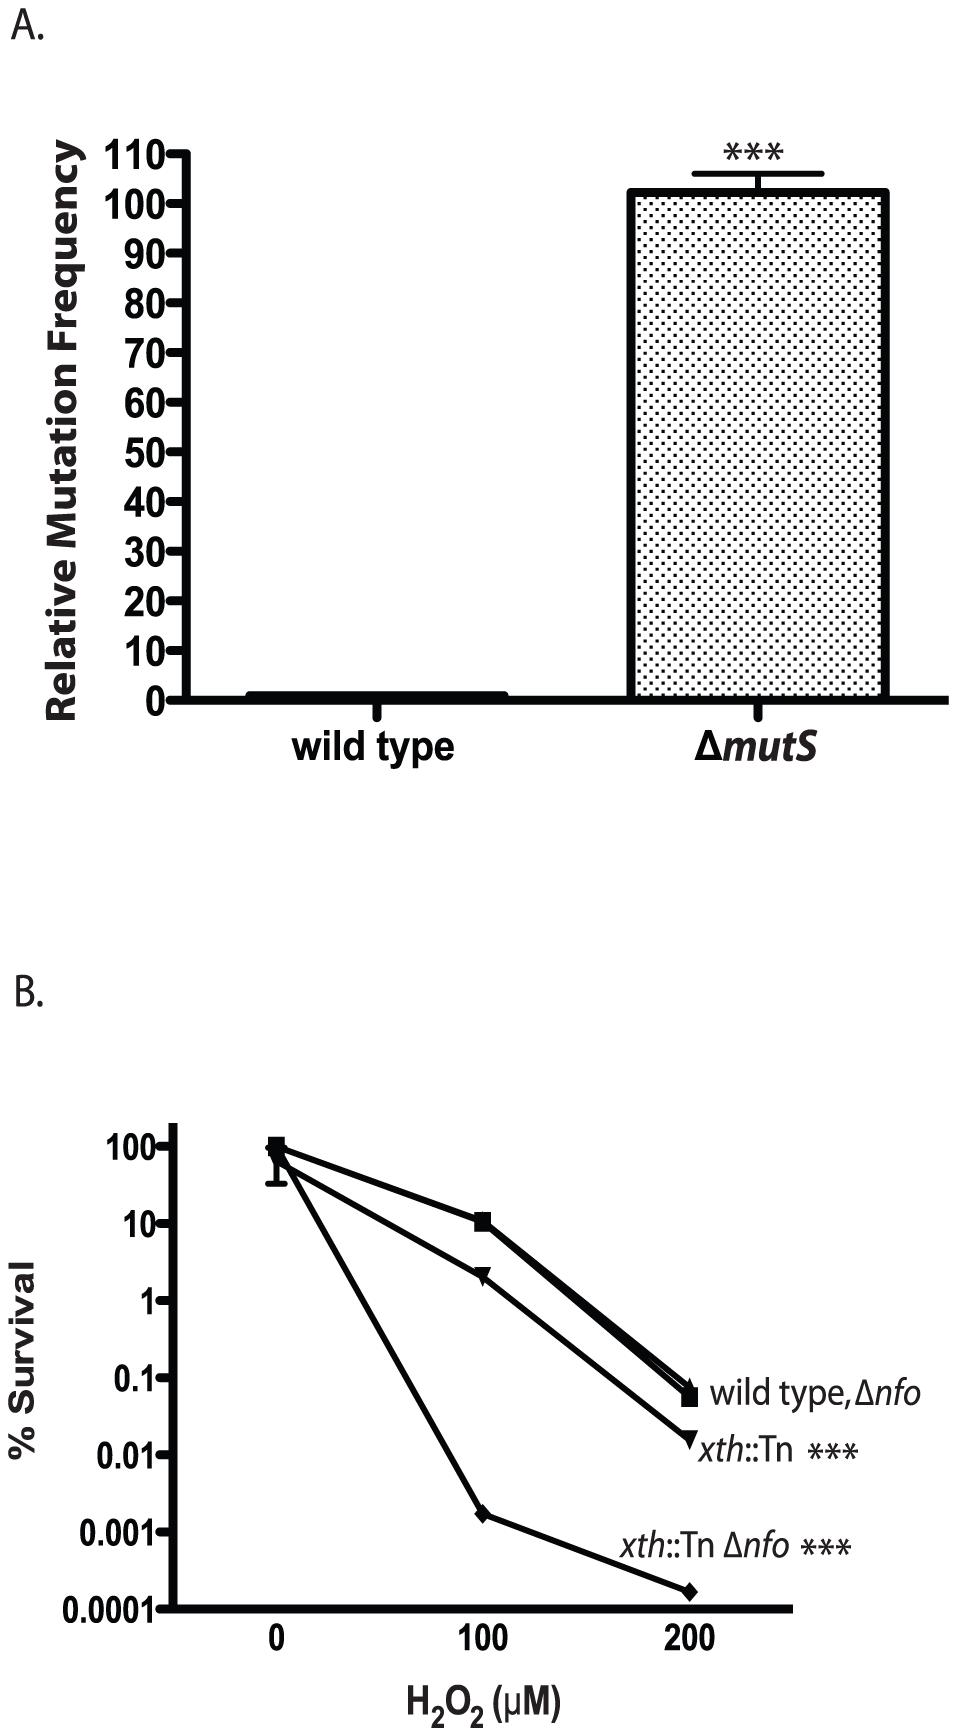 Phenotypes of <i>V. cholerae</i> DNA repair mutants.